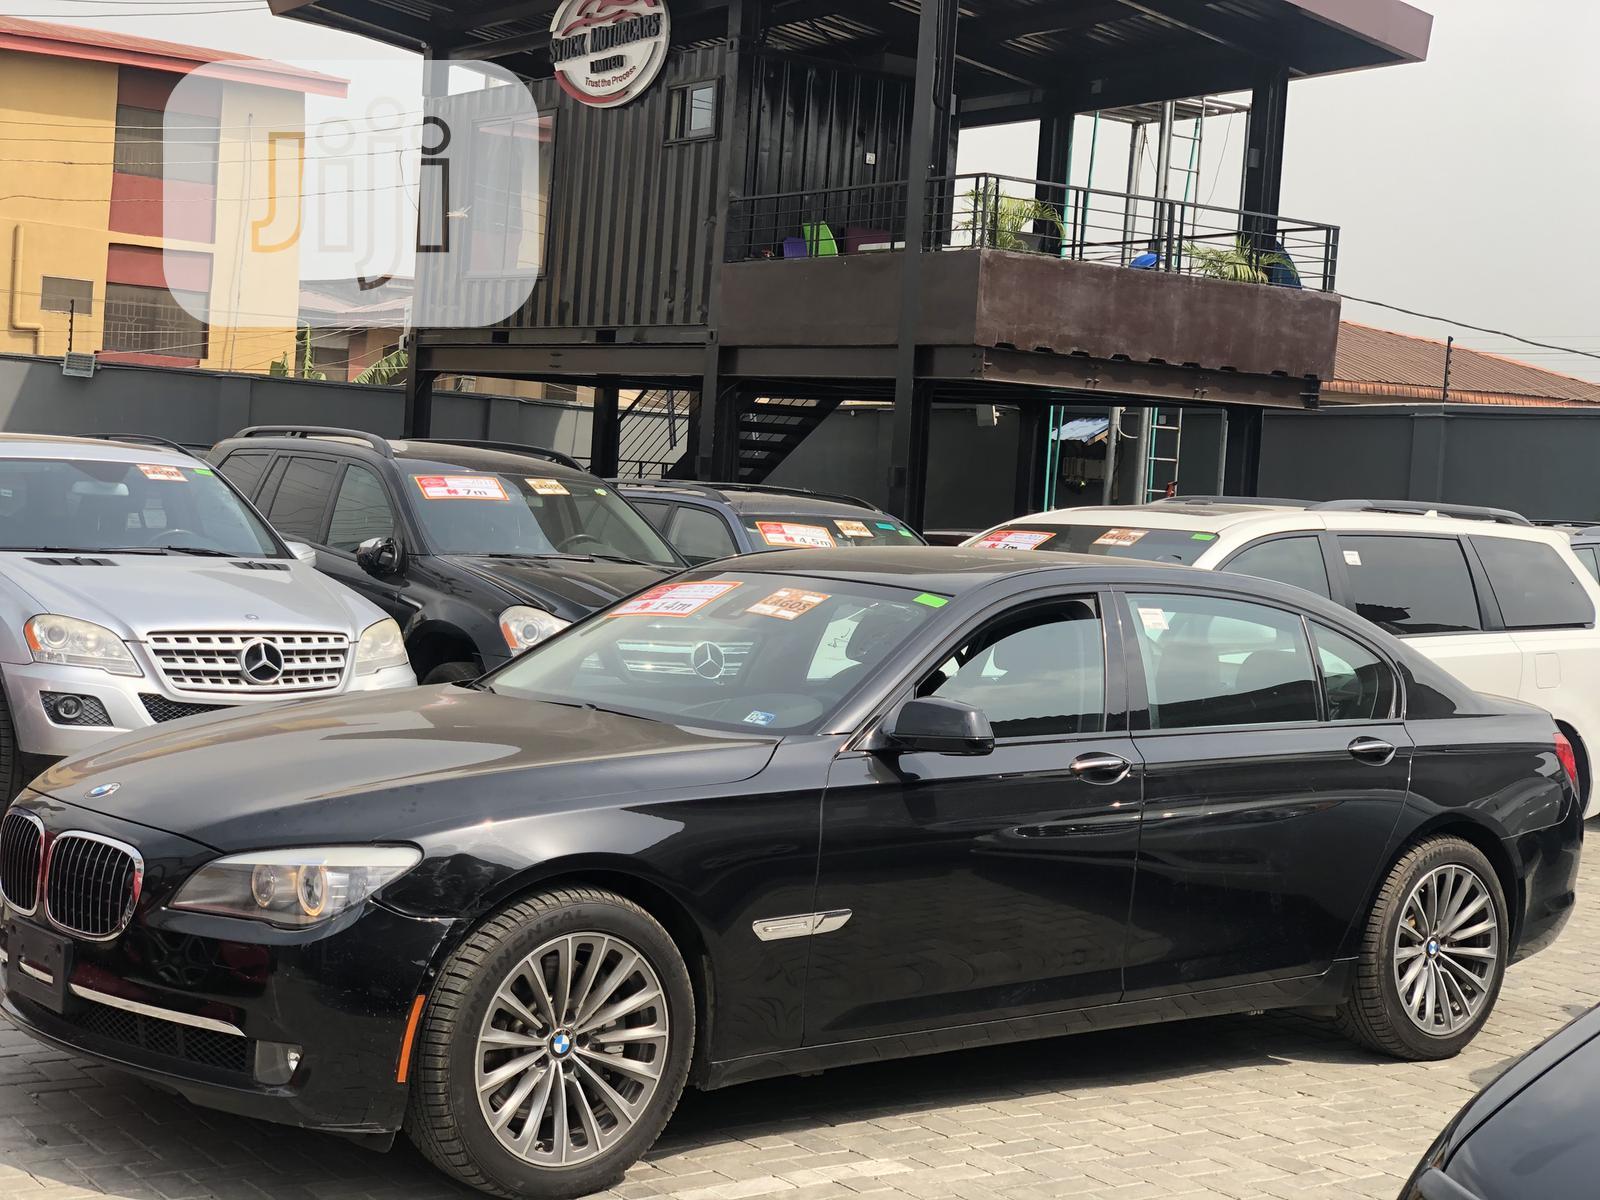 Archive: BMW 7 Series 2011 Black